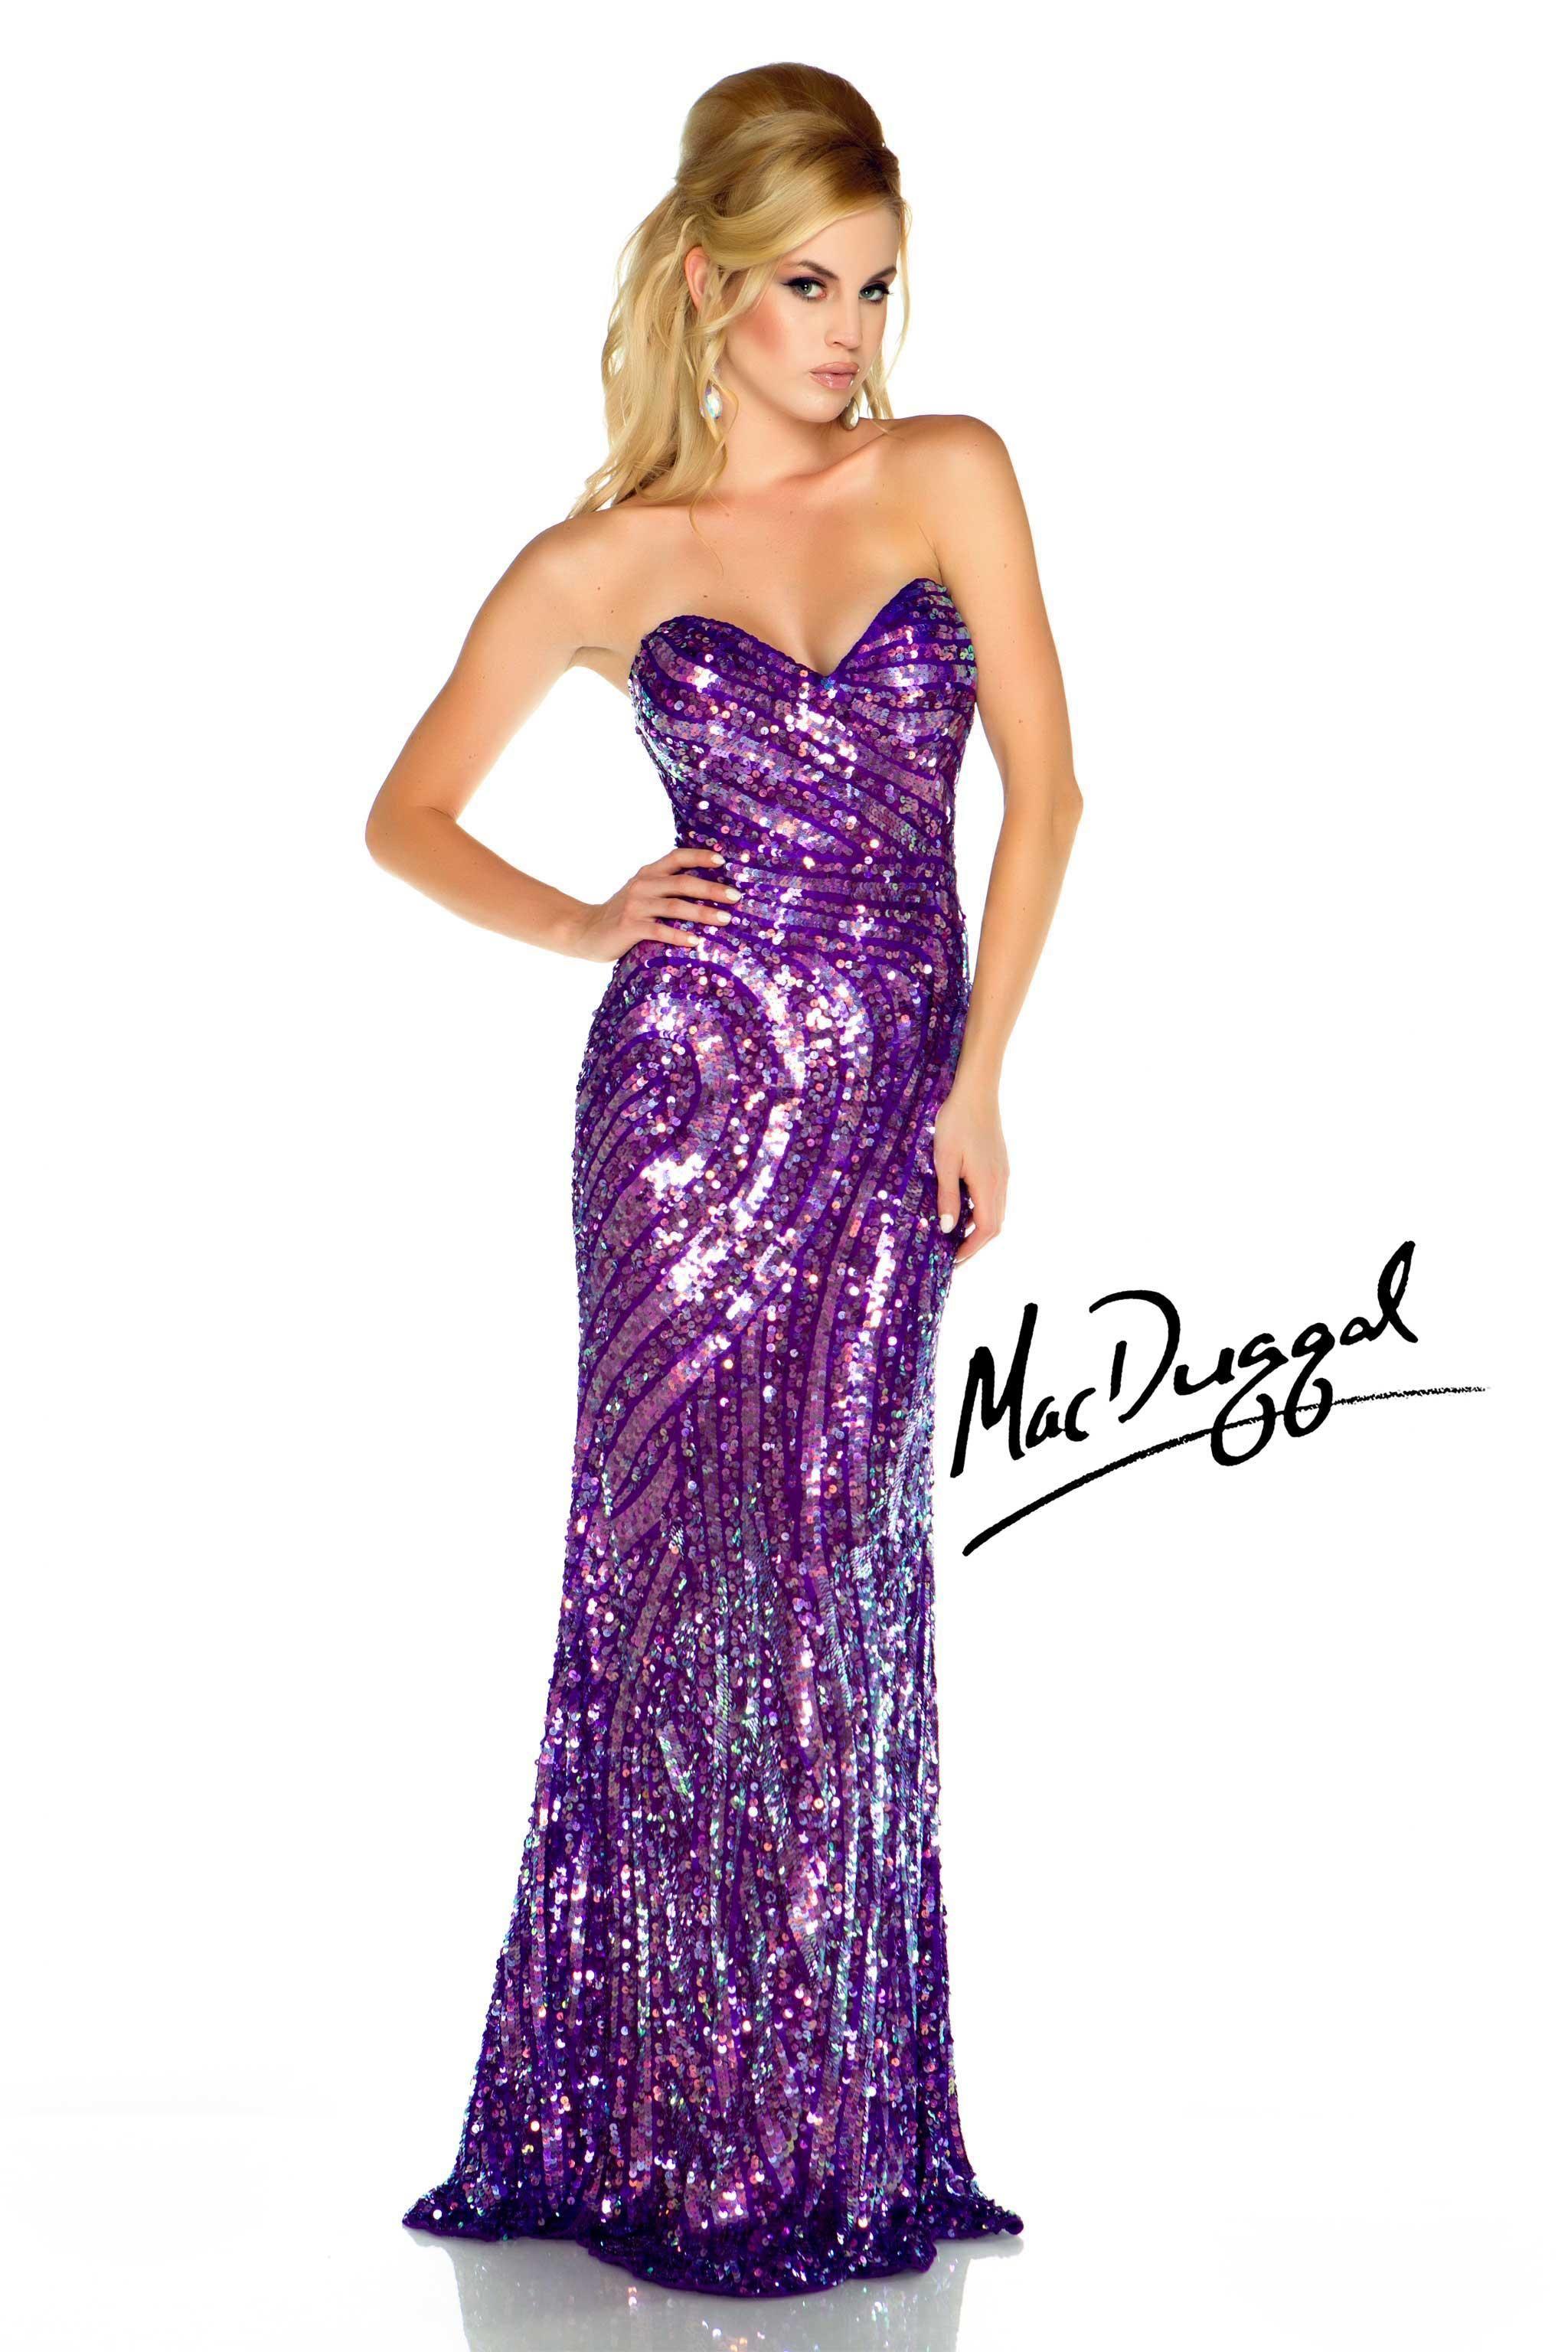 Purple Prom Dress With Sweetheart Neckline | prom | Pinterest